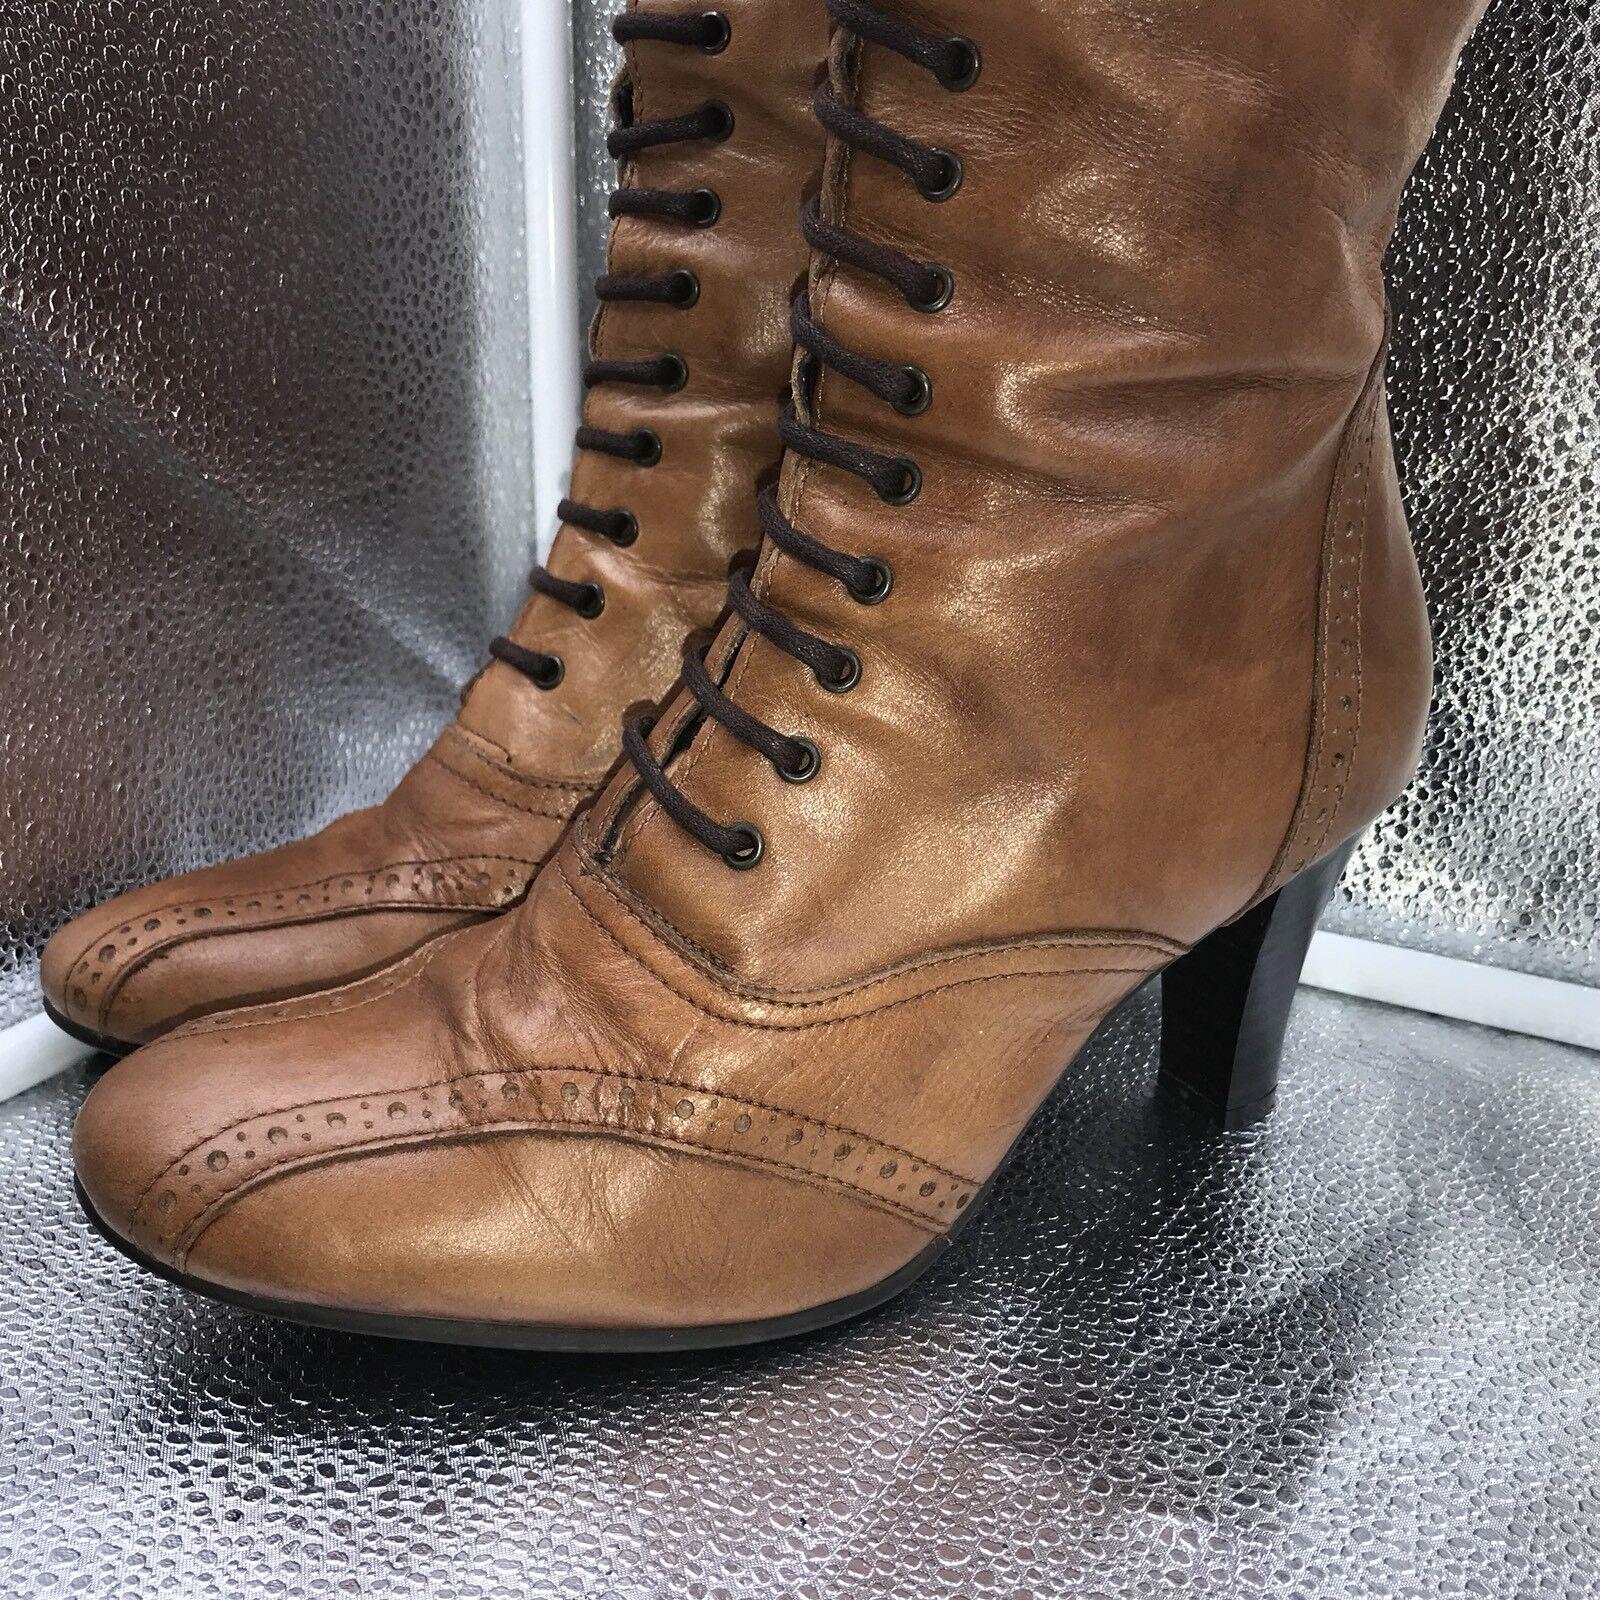 Clarks Sz 38.5 5.5 Braun Leder Victorian Up Lace Up Victorian Stiefel Goth SteamPunk Damenschuhe ddb0b1